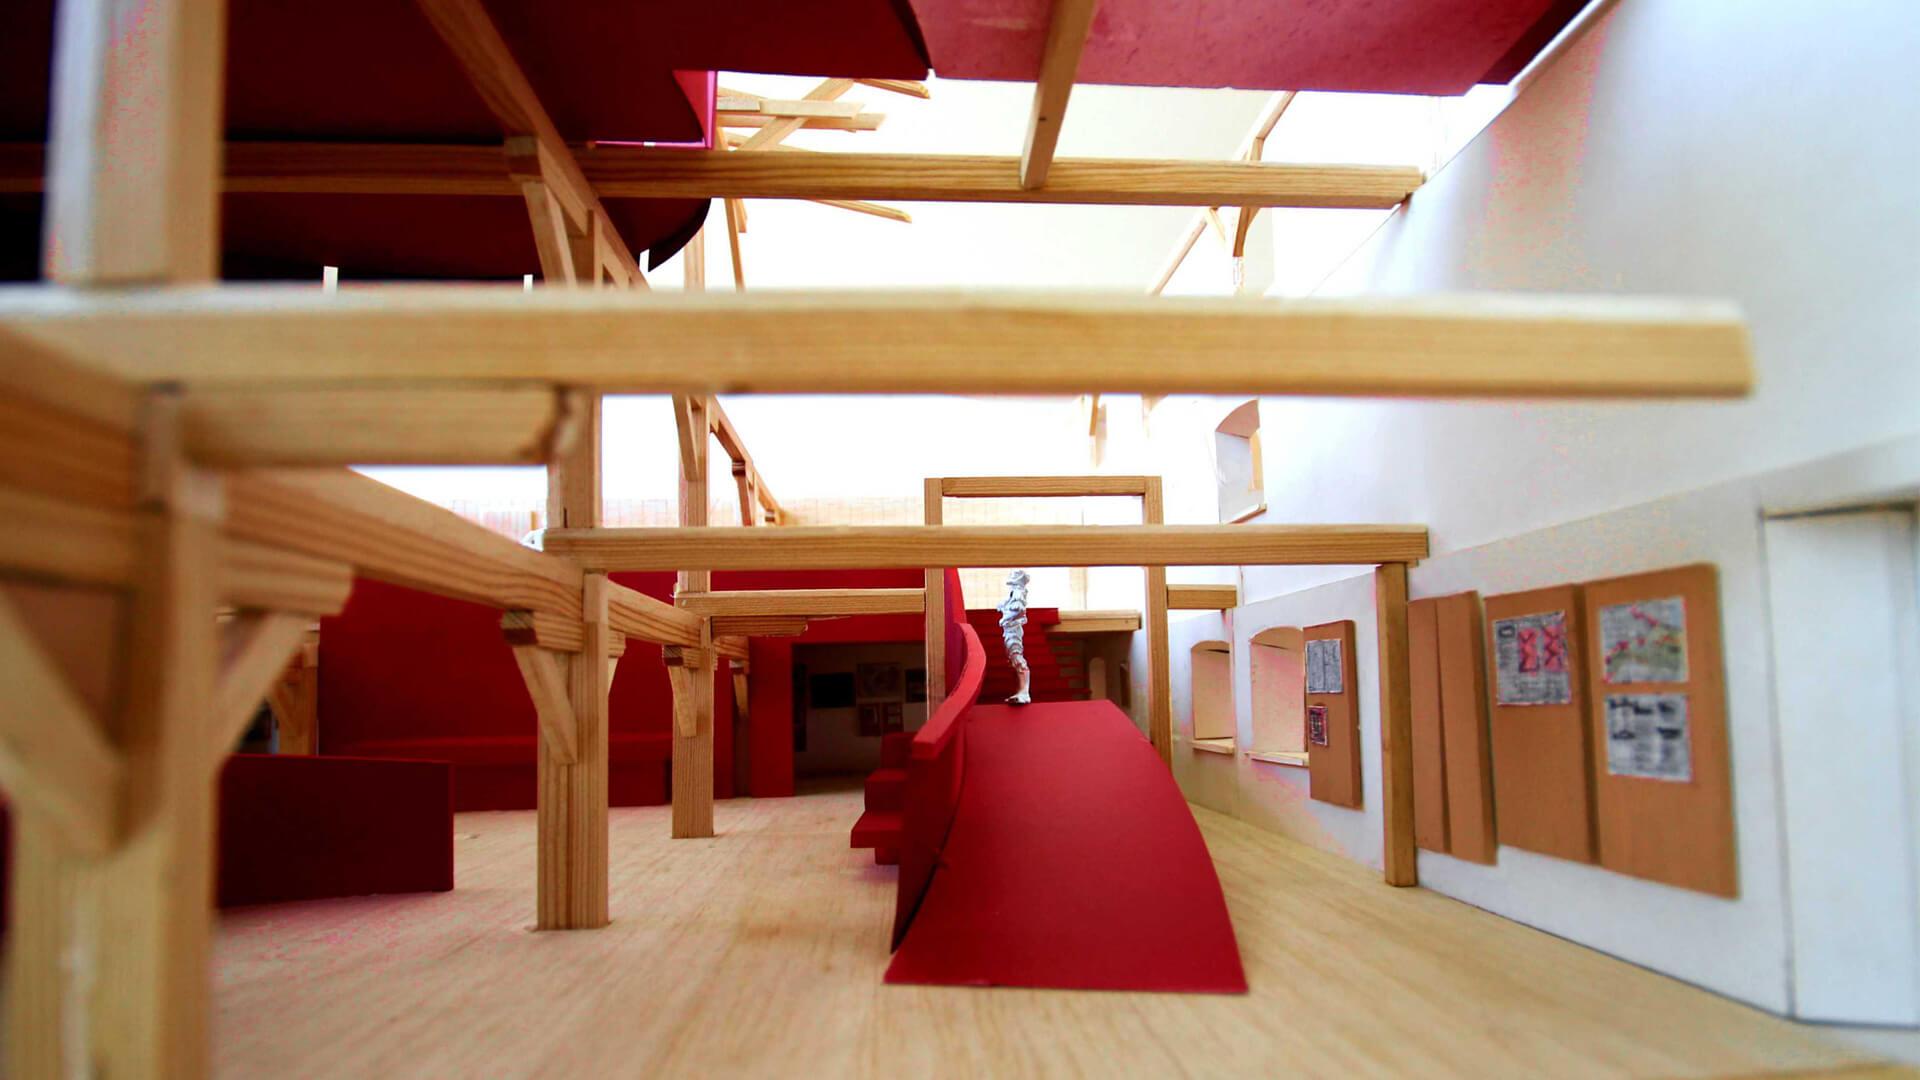 Stiegl-Brauwelt_museum-goes-interactive_04